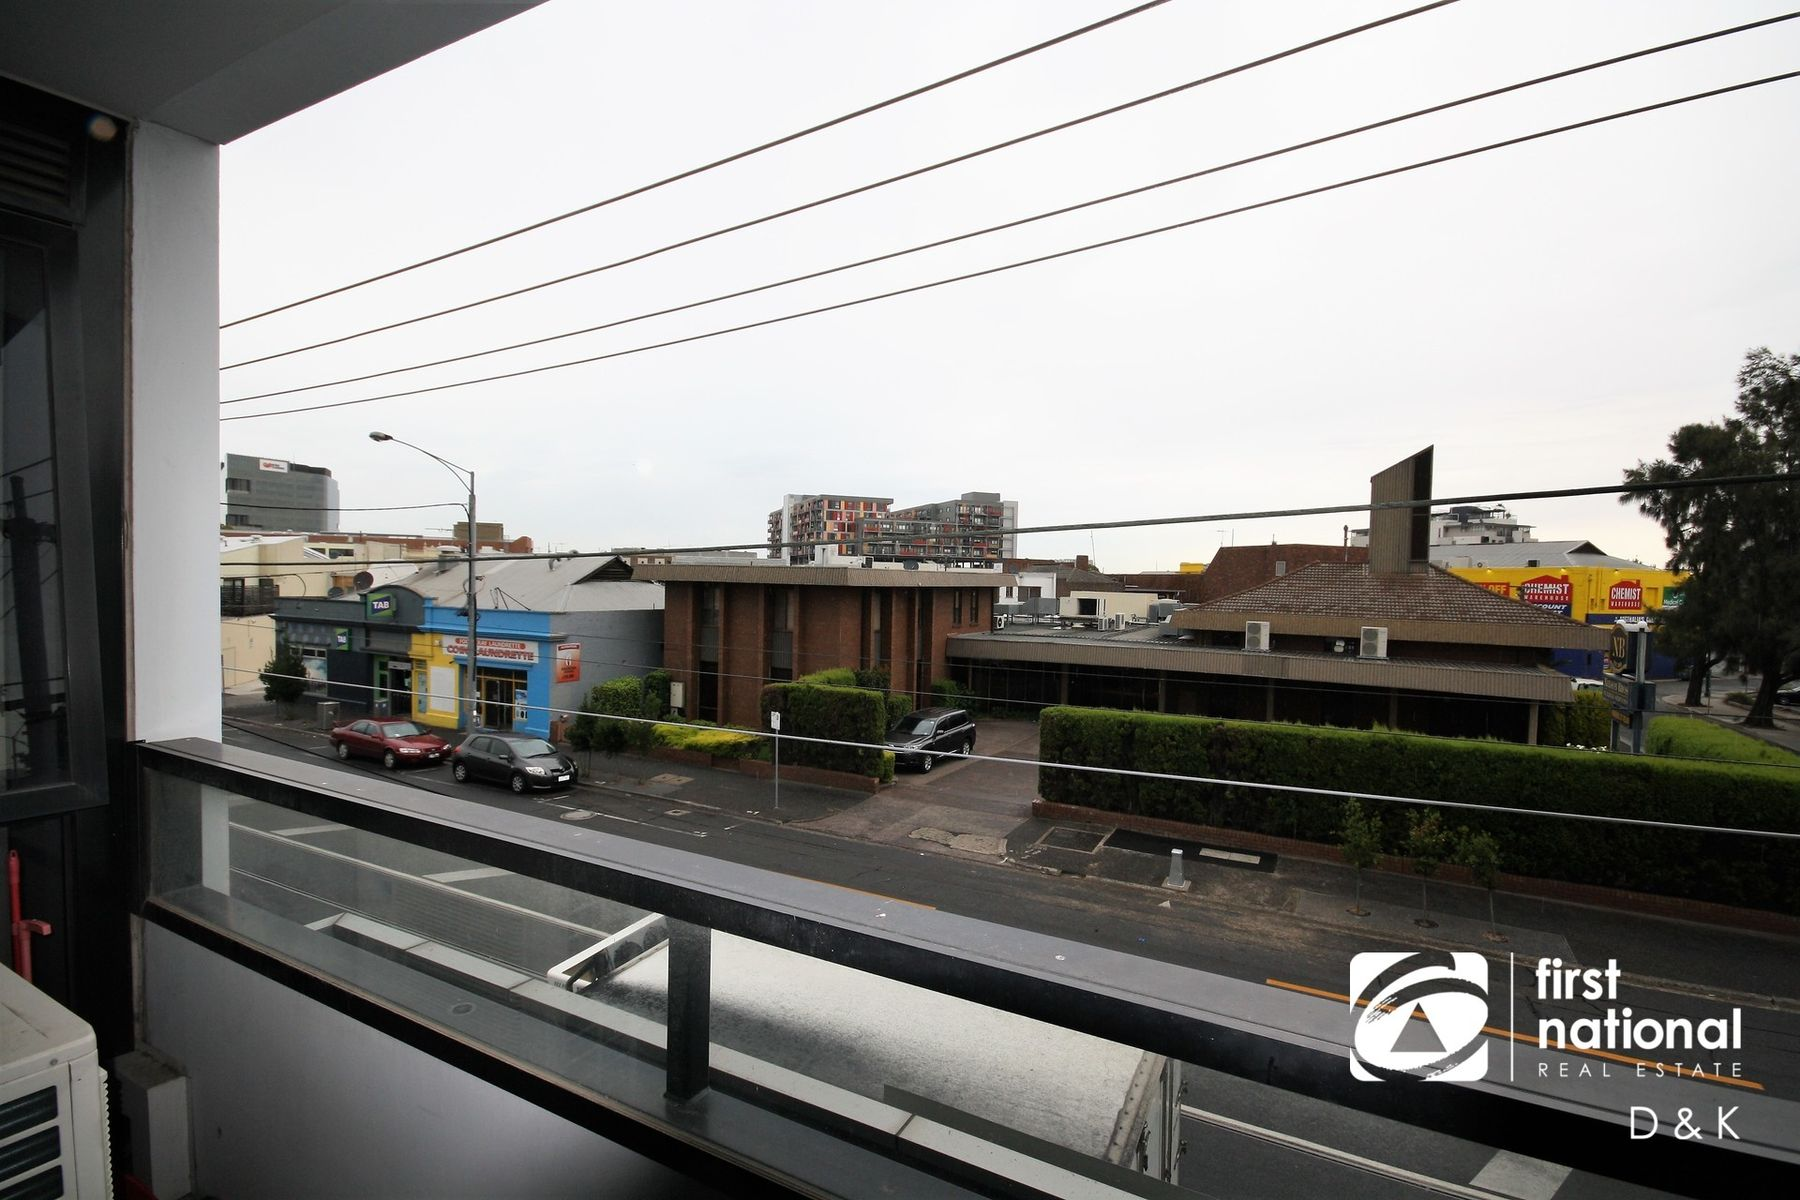 201A/10 Droop Street, Footscray, VIC 3011